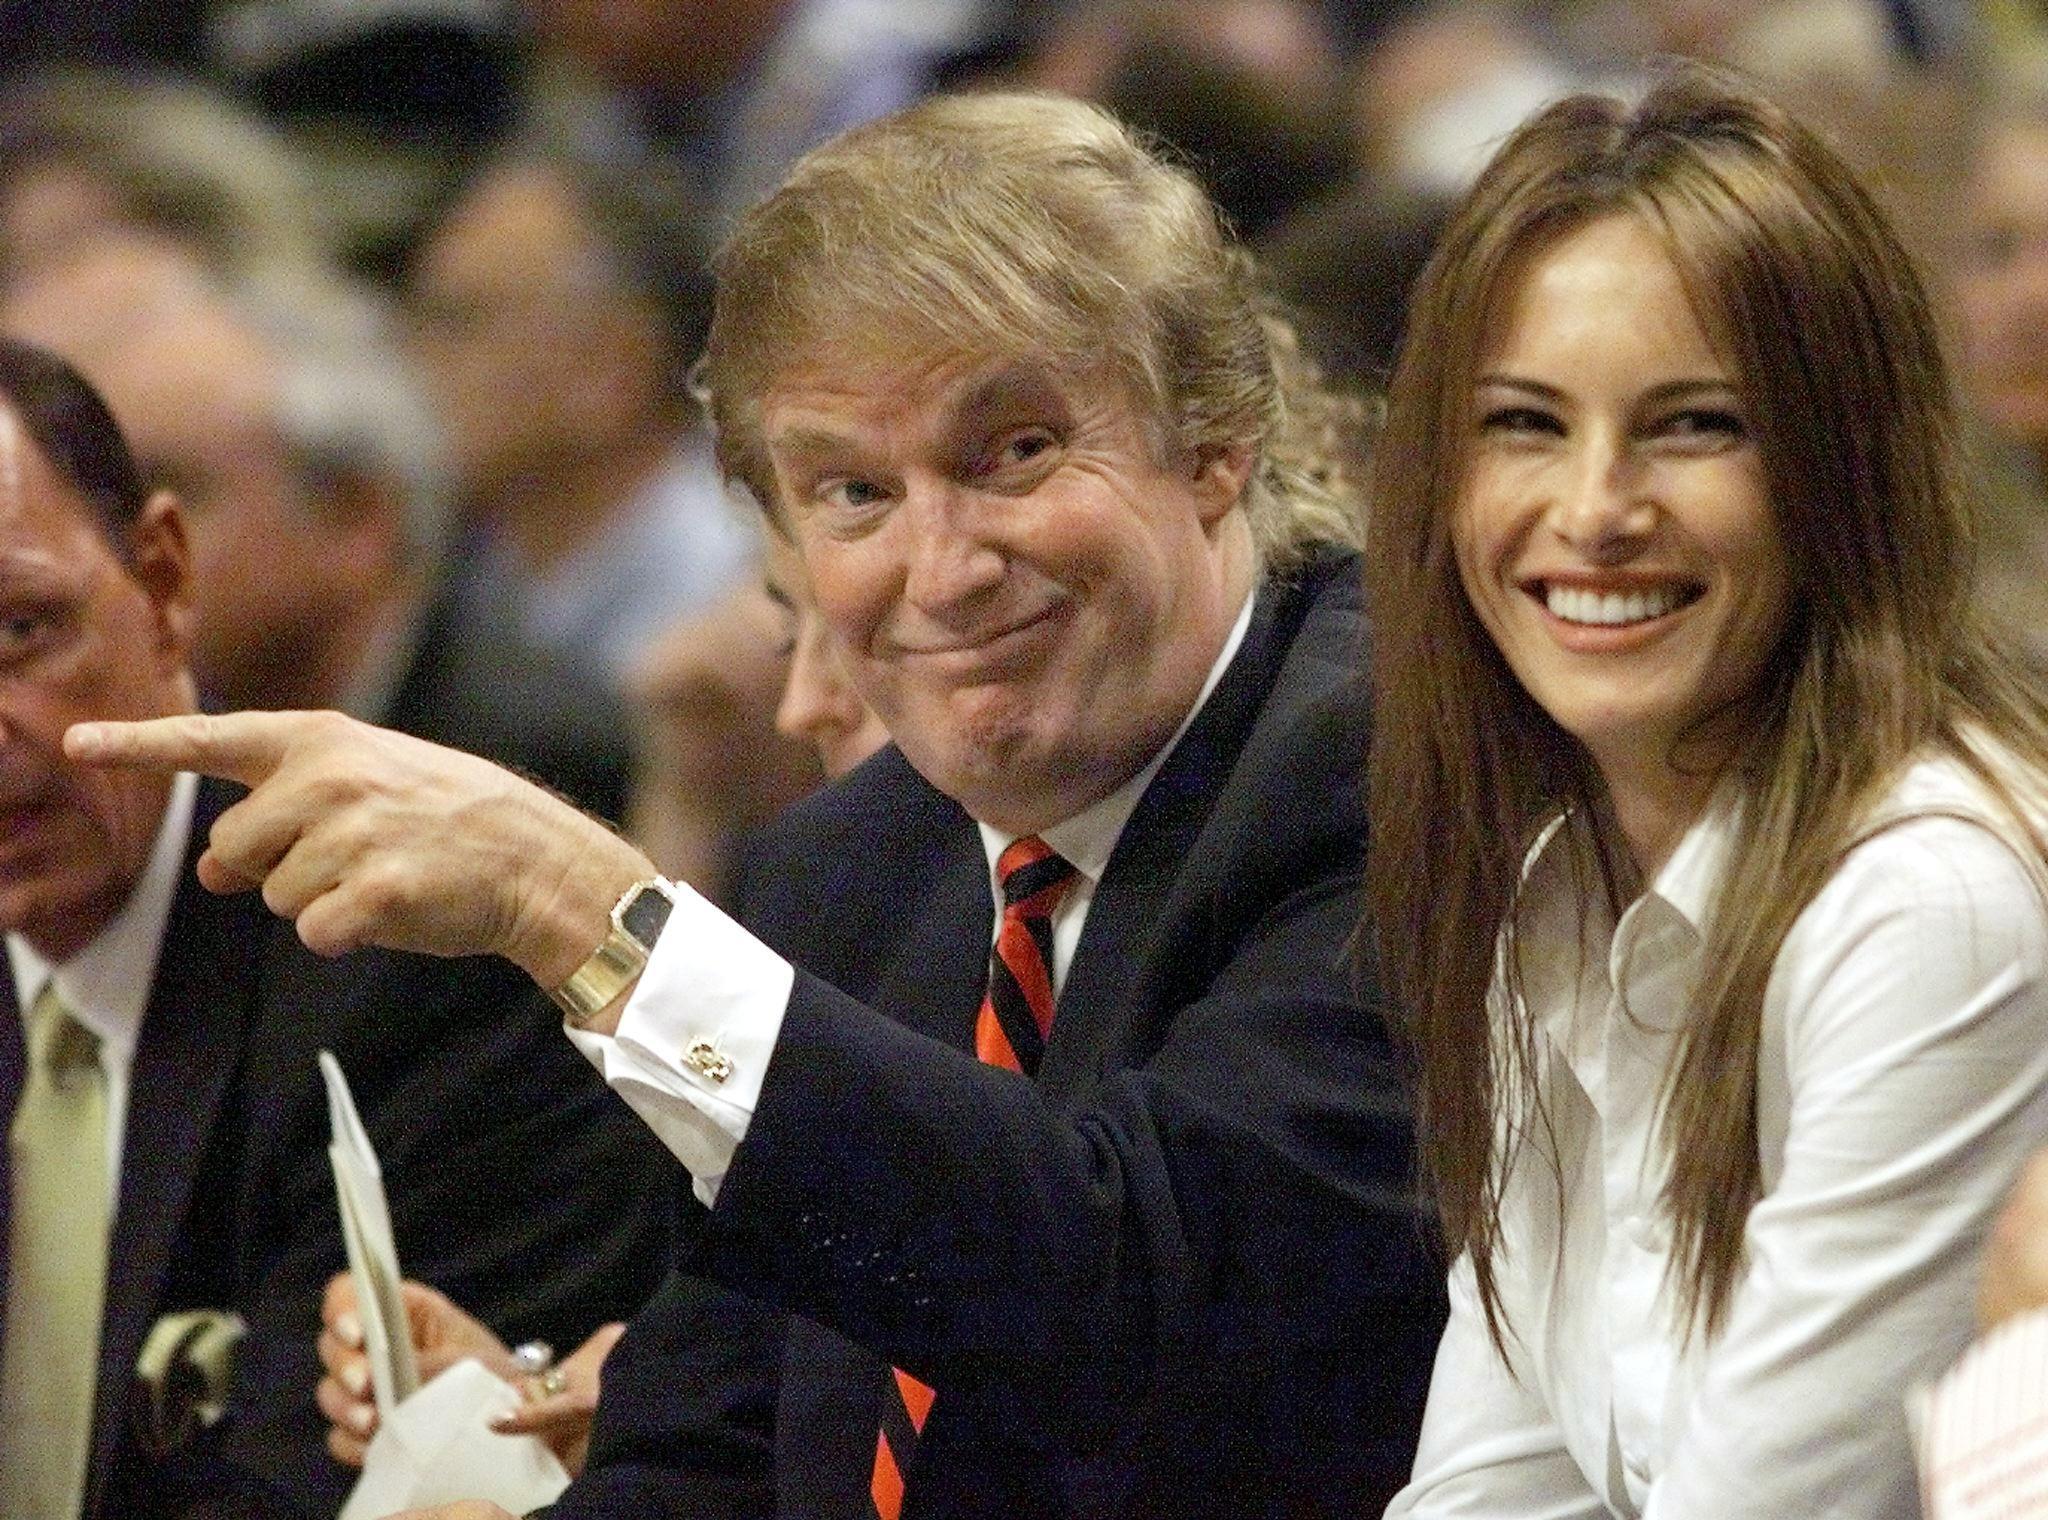 Donald Trump at a New York Knicks game